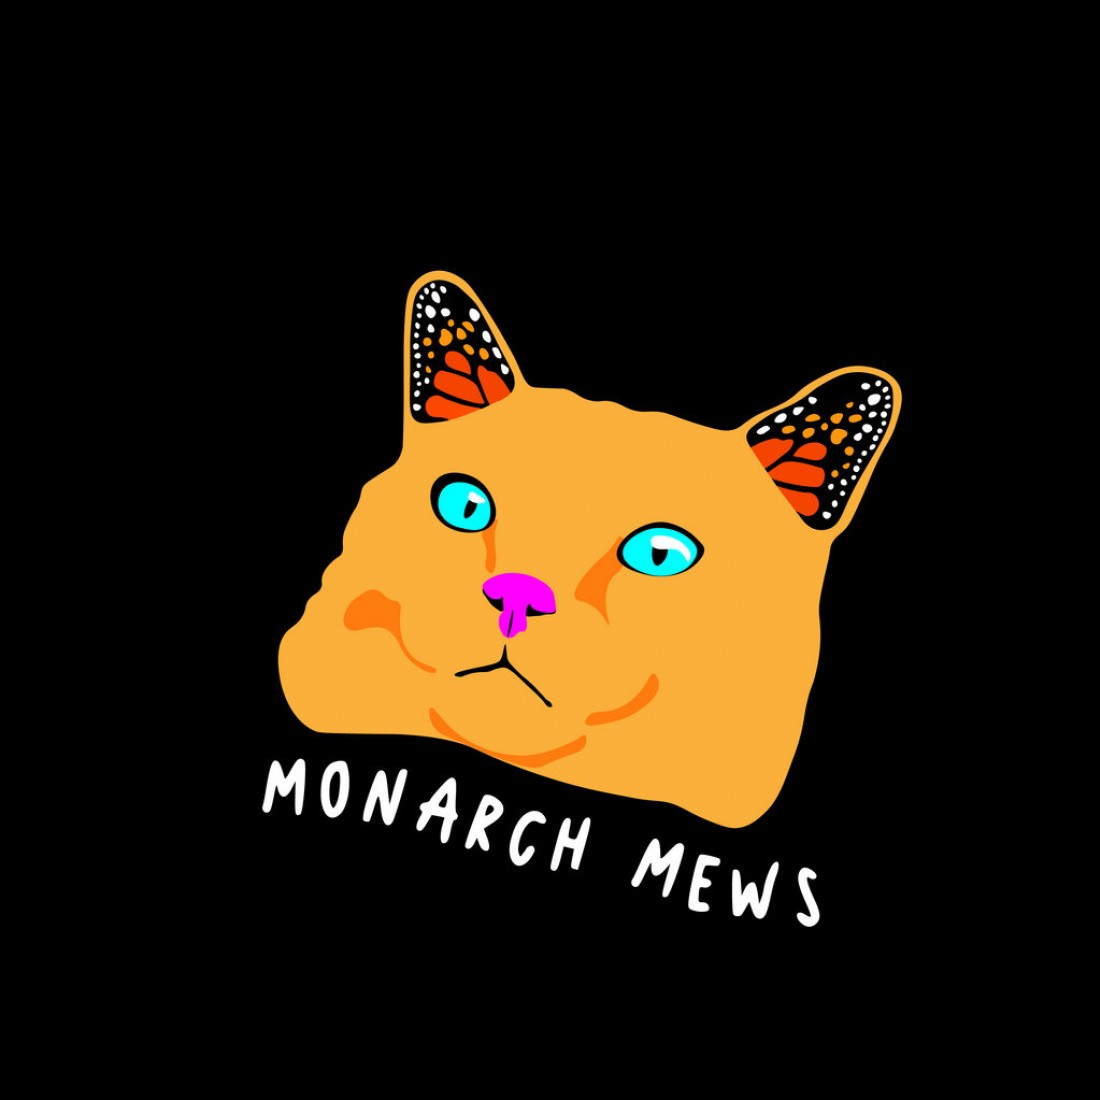 monarch mews